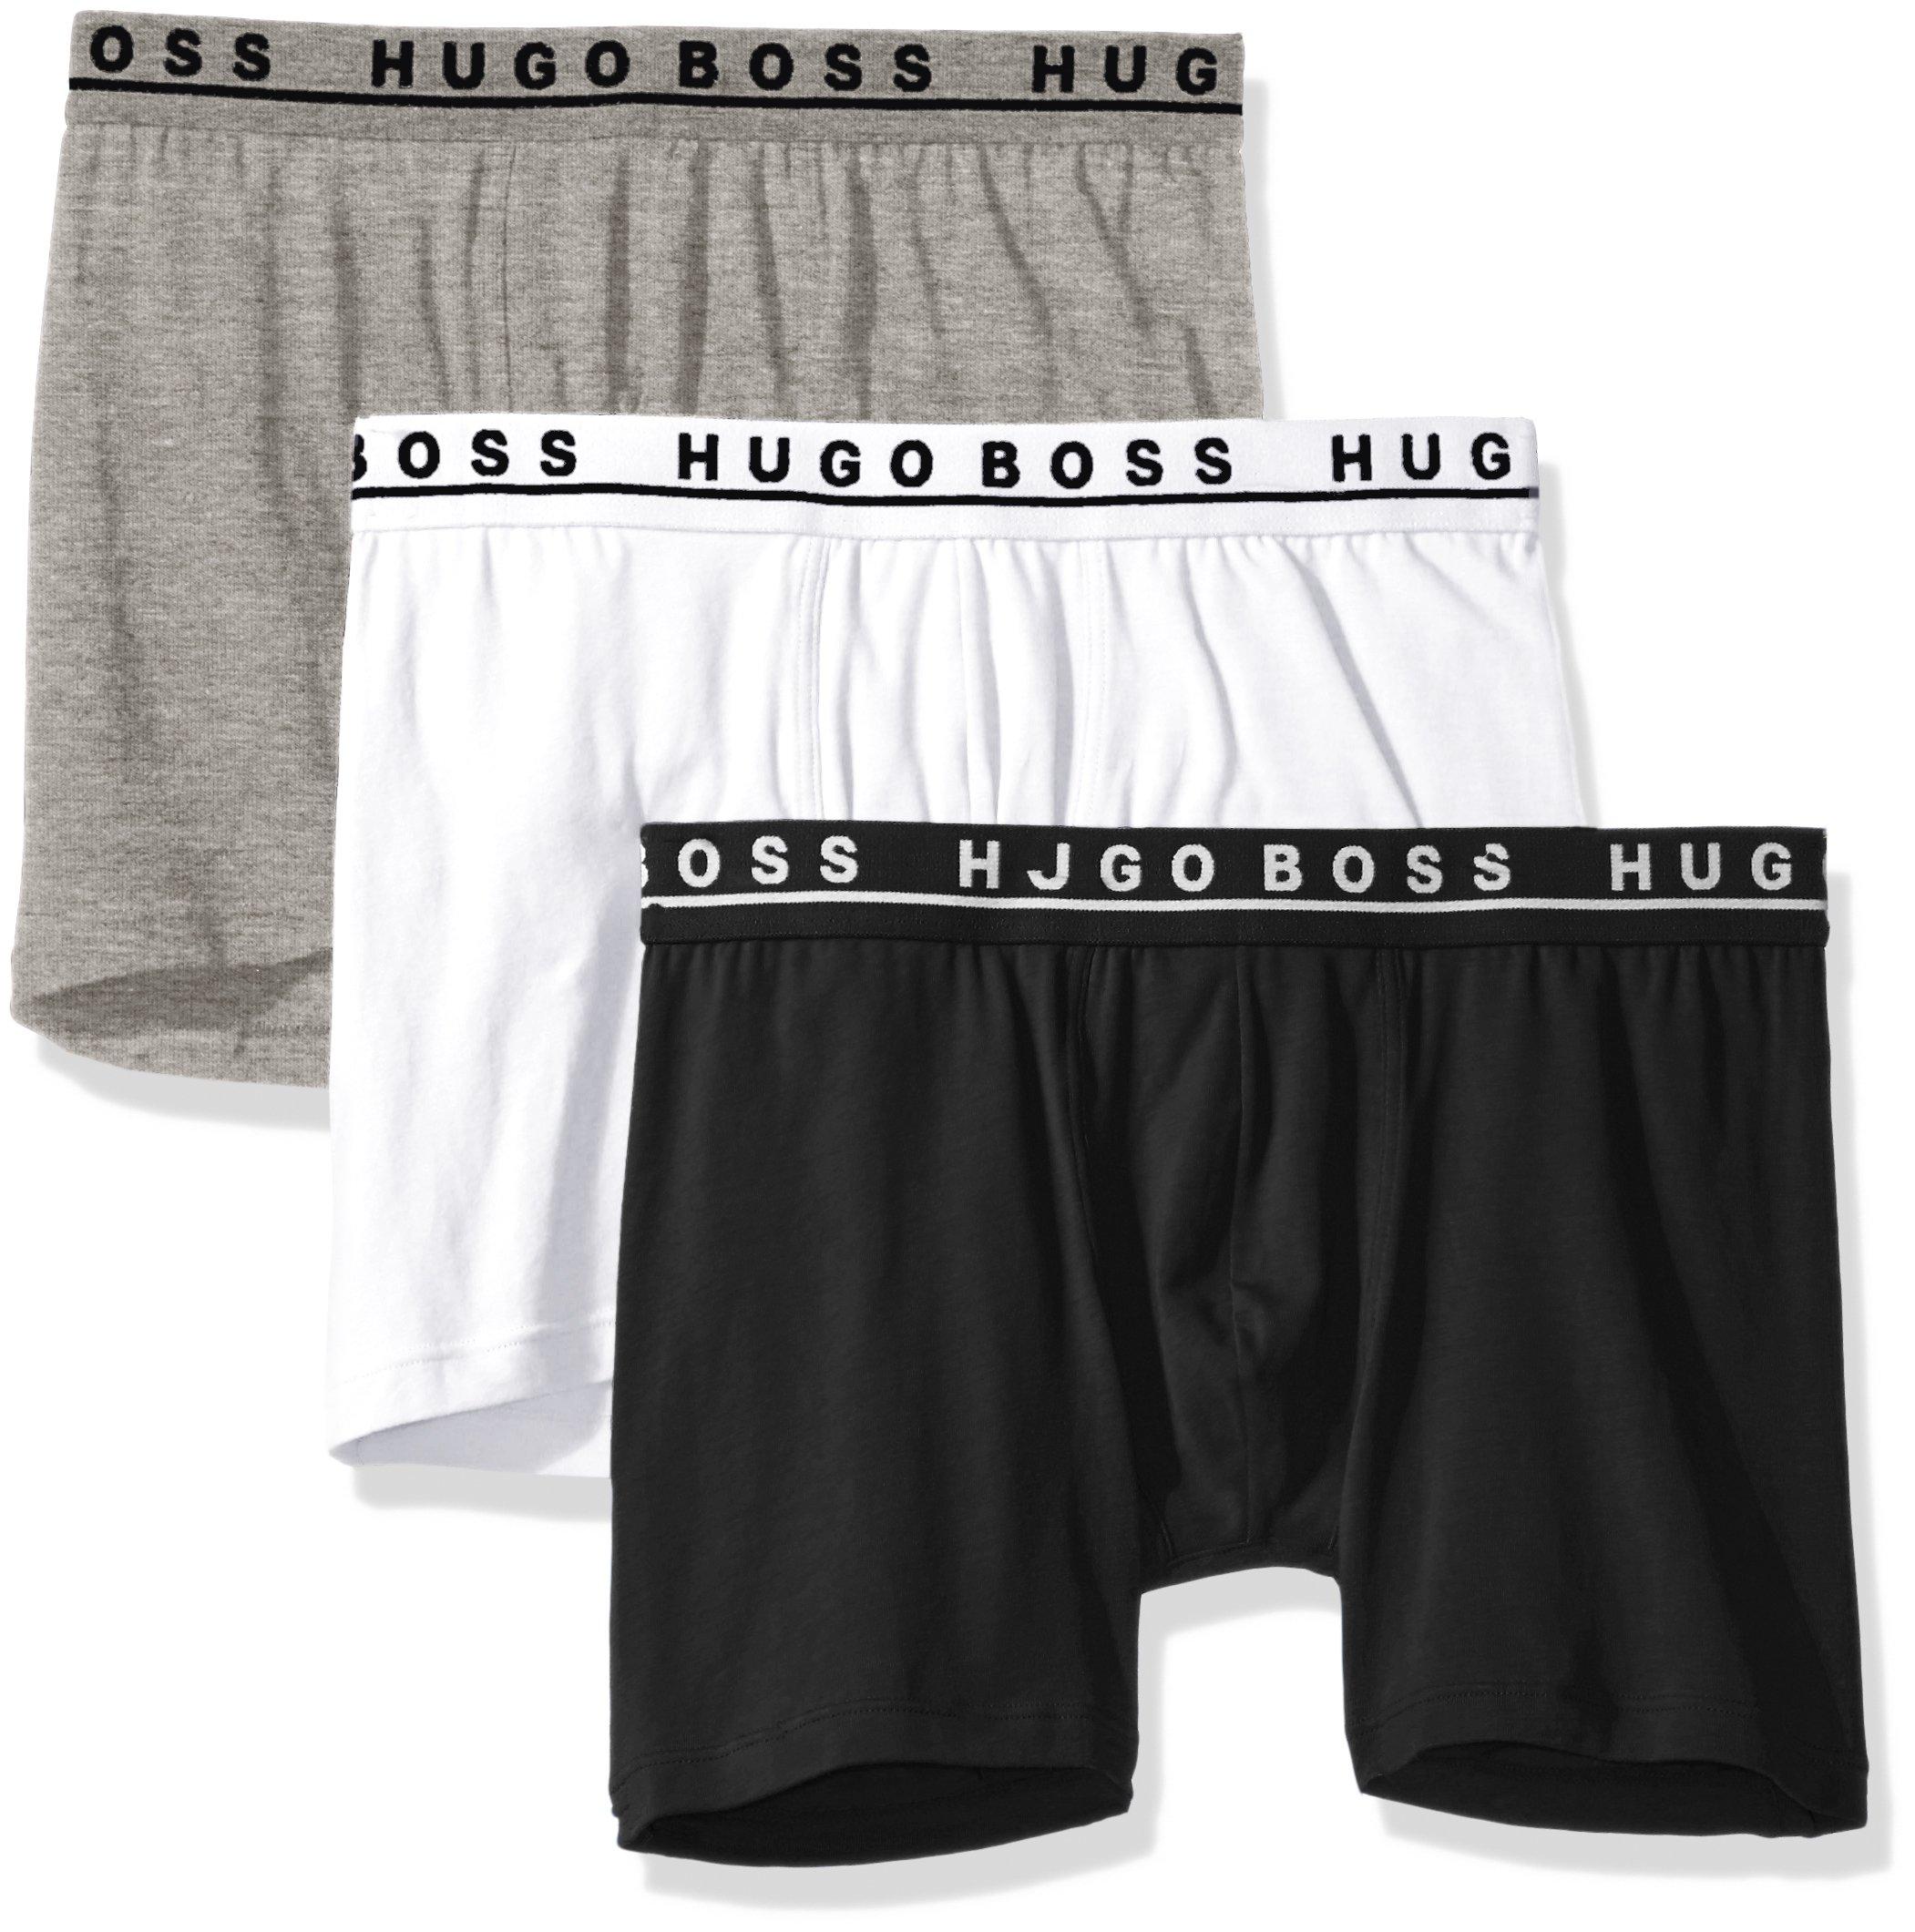 Hugo Boss BOSS Men's Cotton Stretch Boxer Brief, Pack of 3, Black/Grey/White, Large